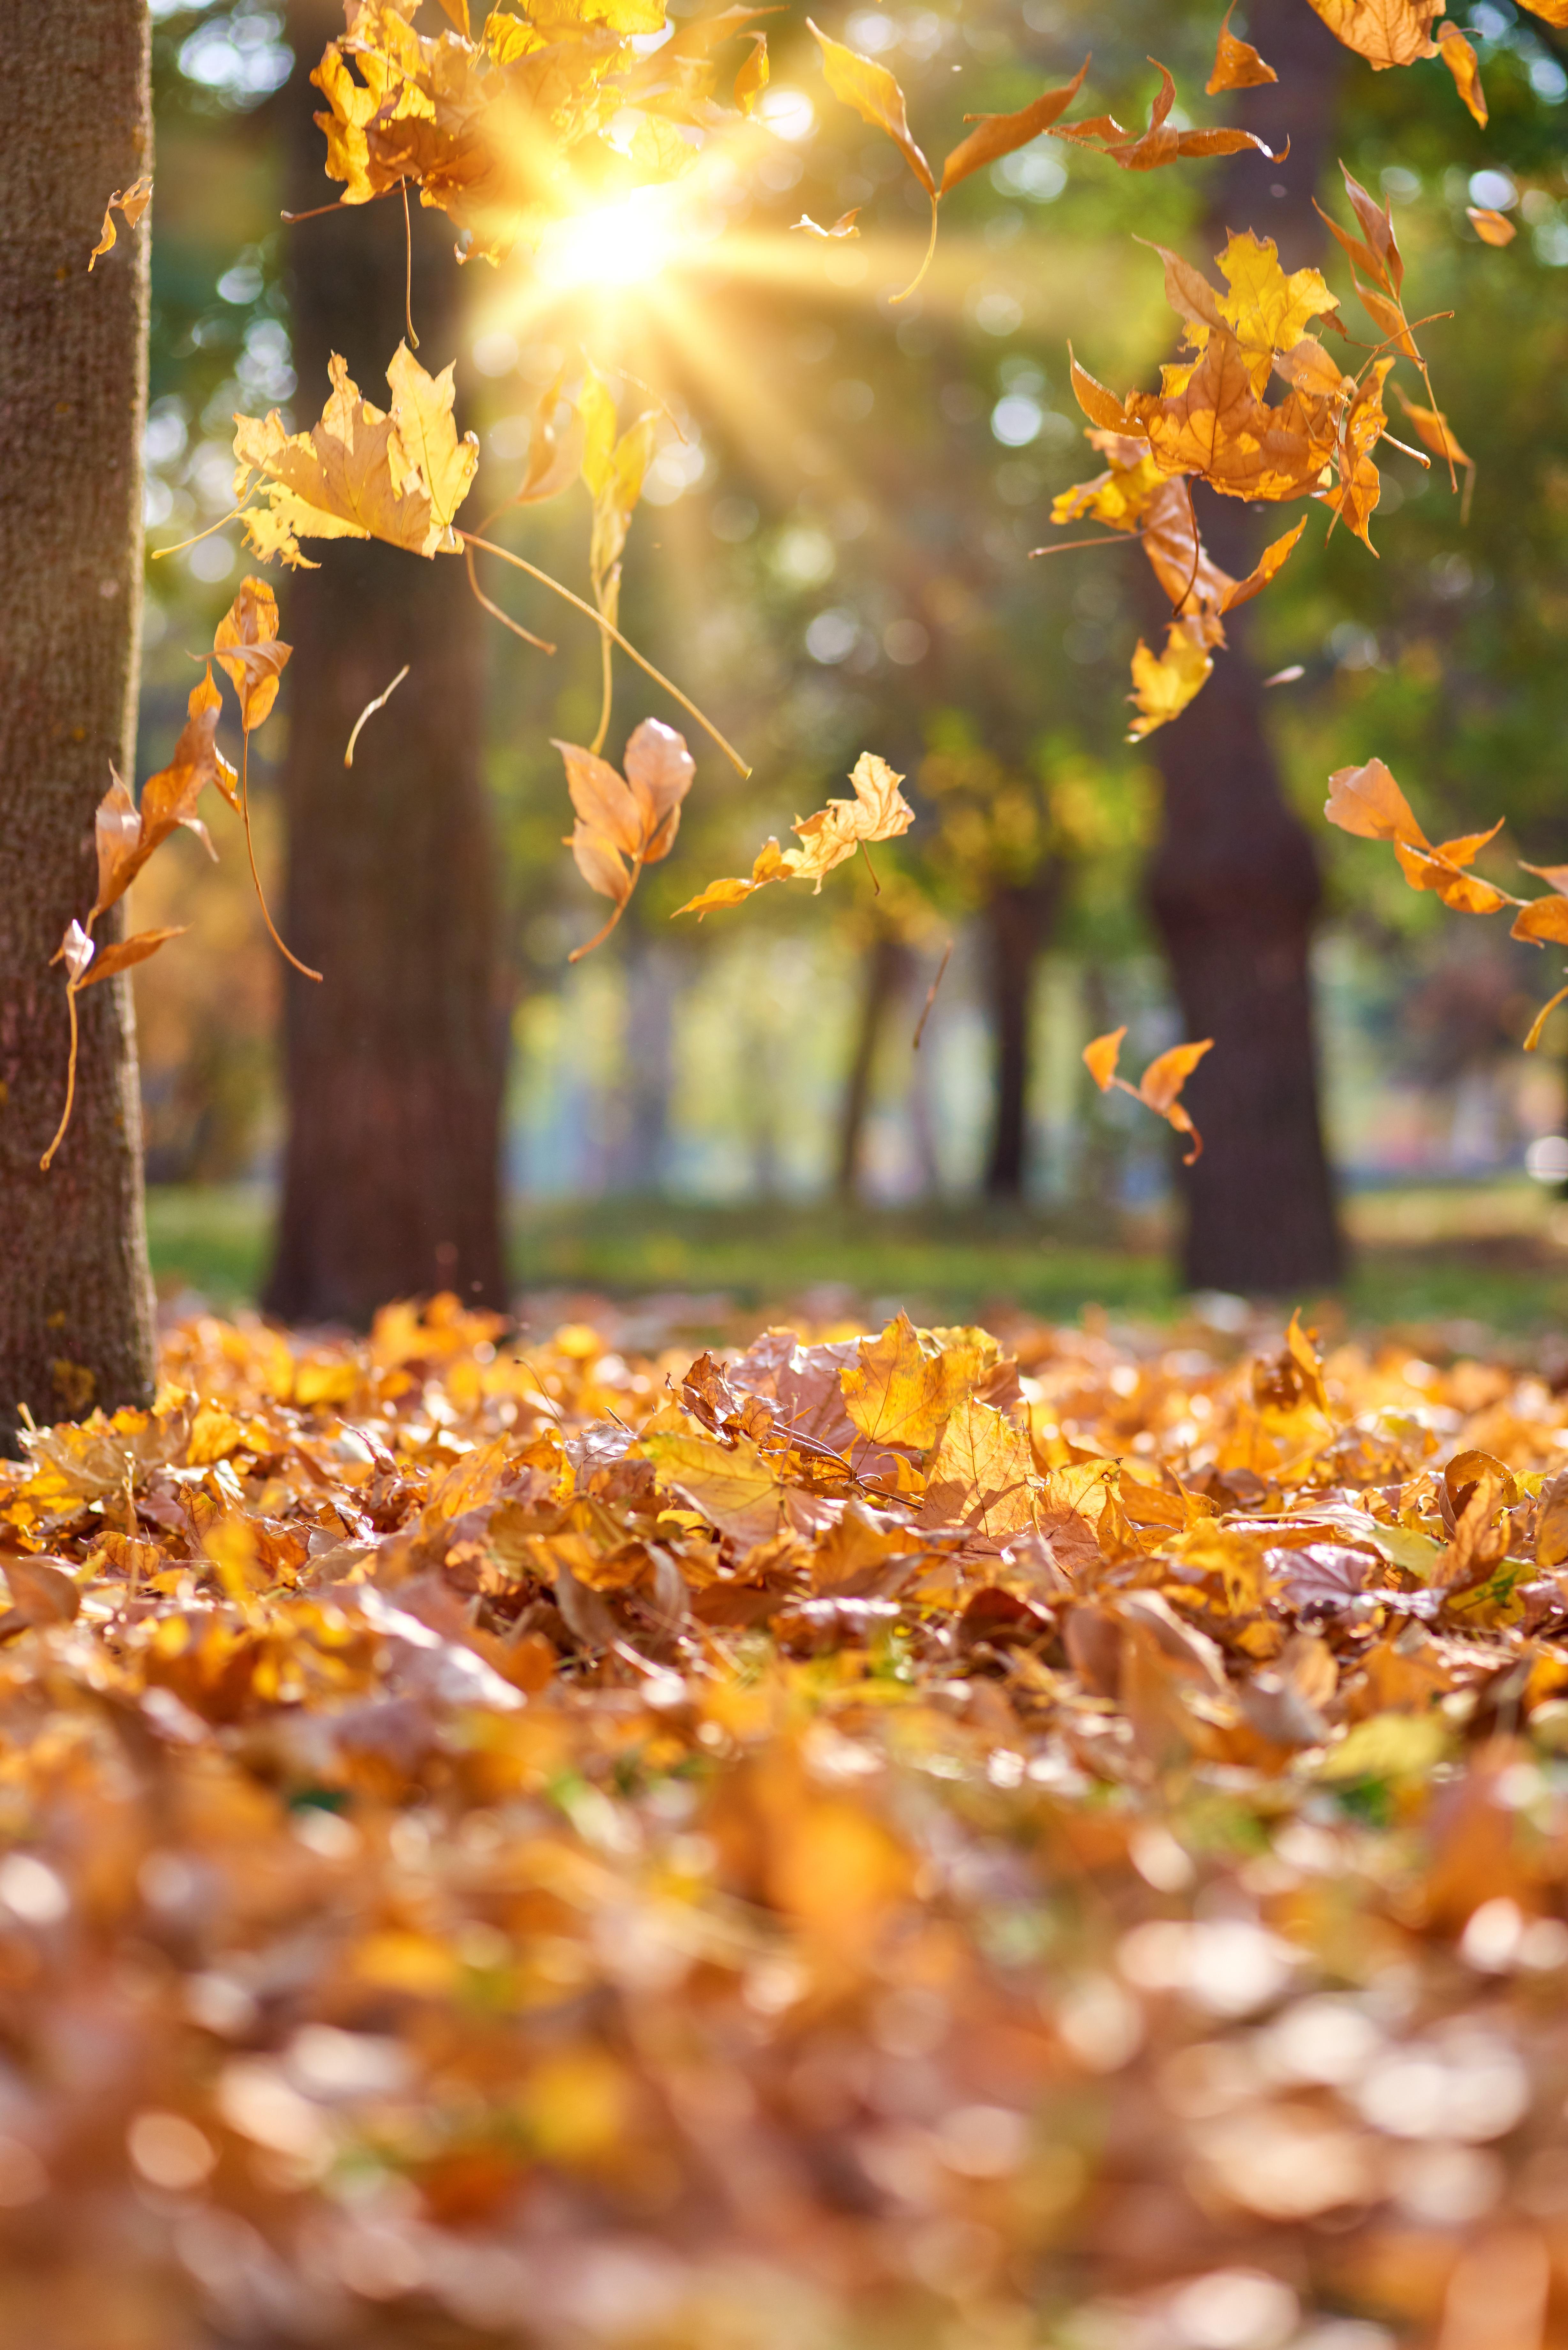 Tawakkul- a leaf falling